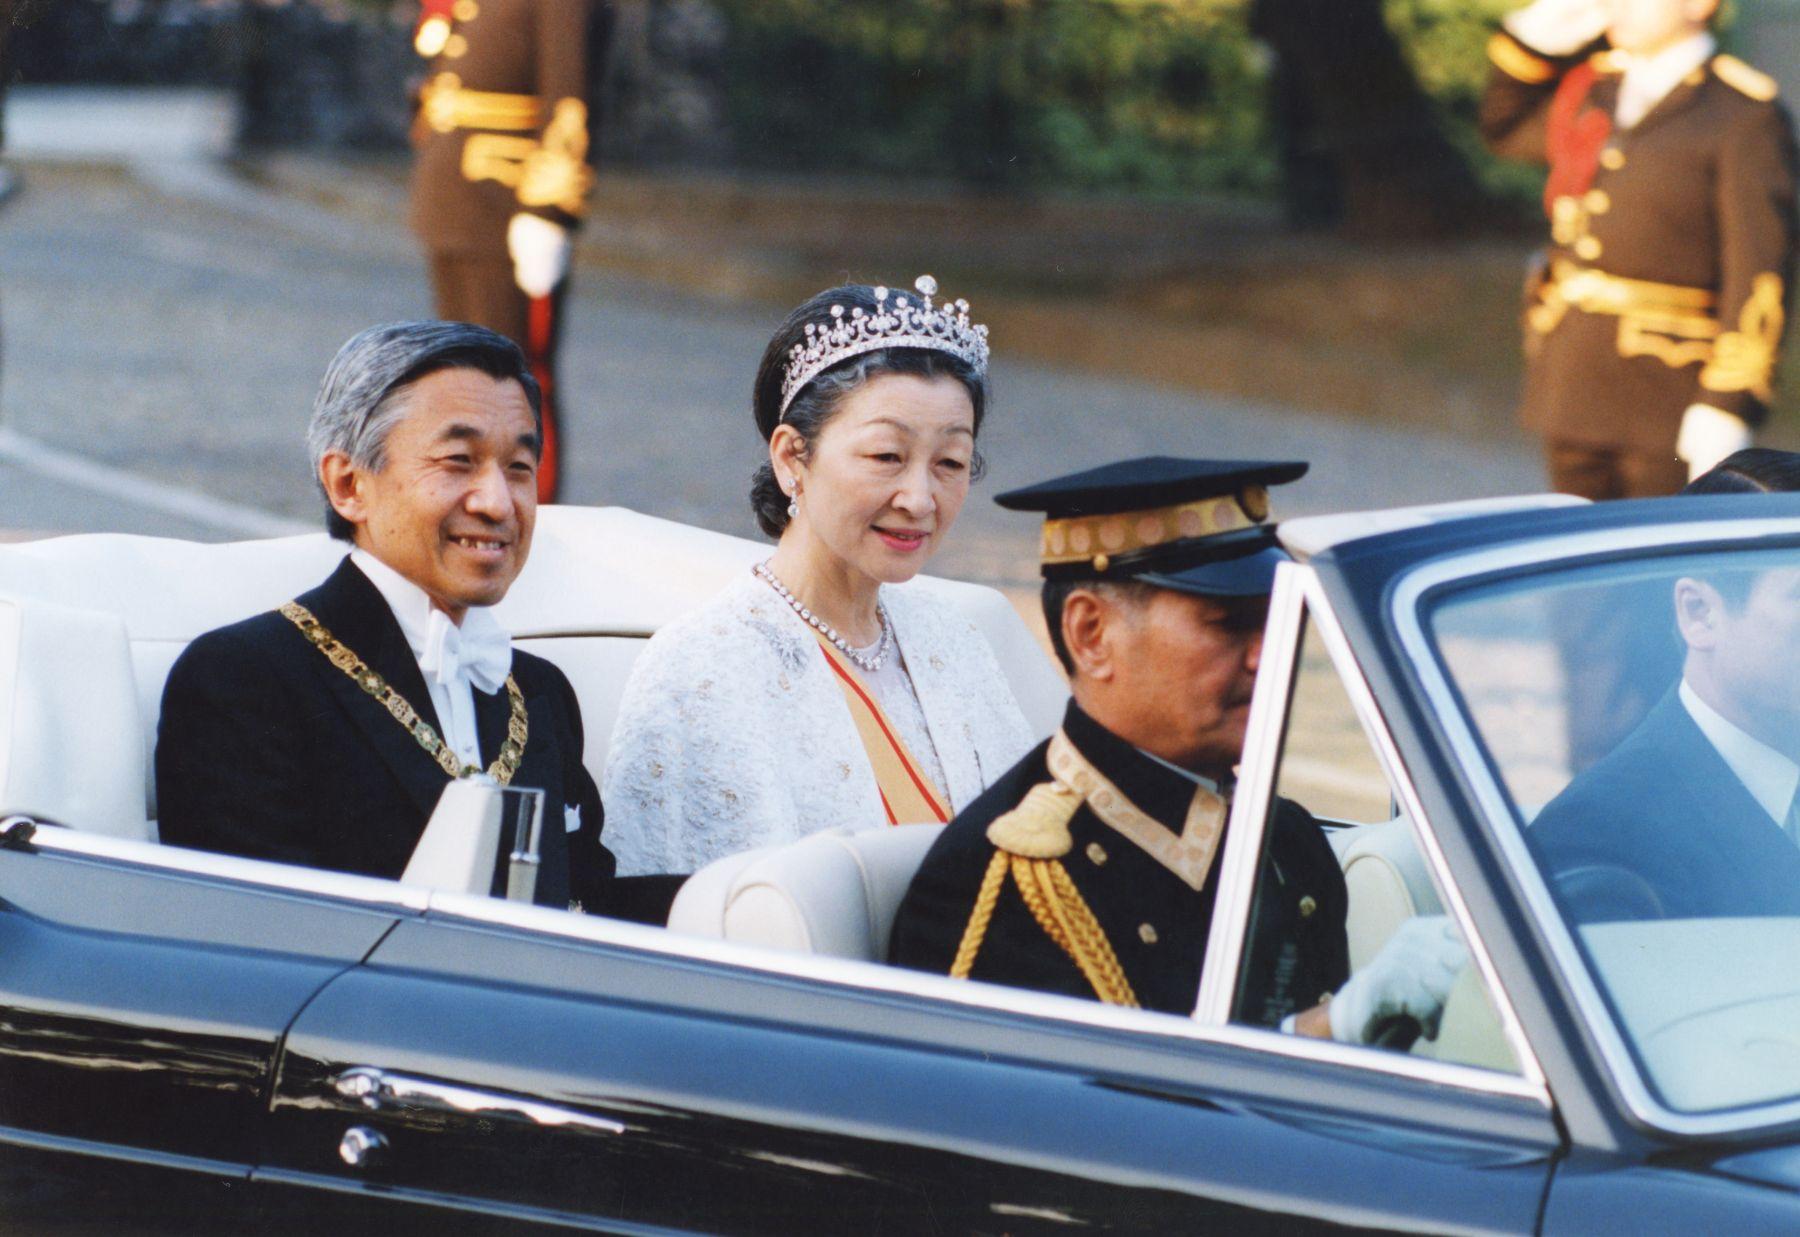 Japan Imperial Trivia Empress Tiara and Dresses 009